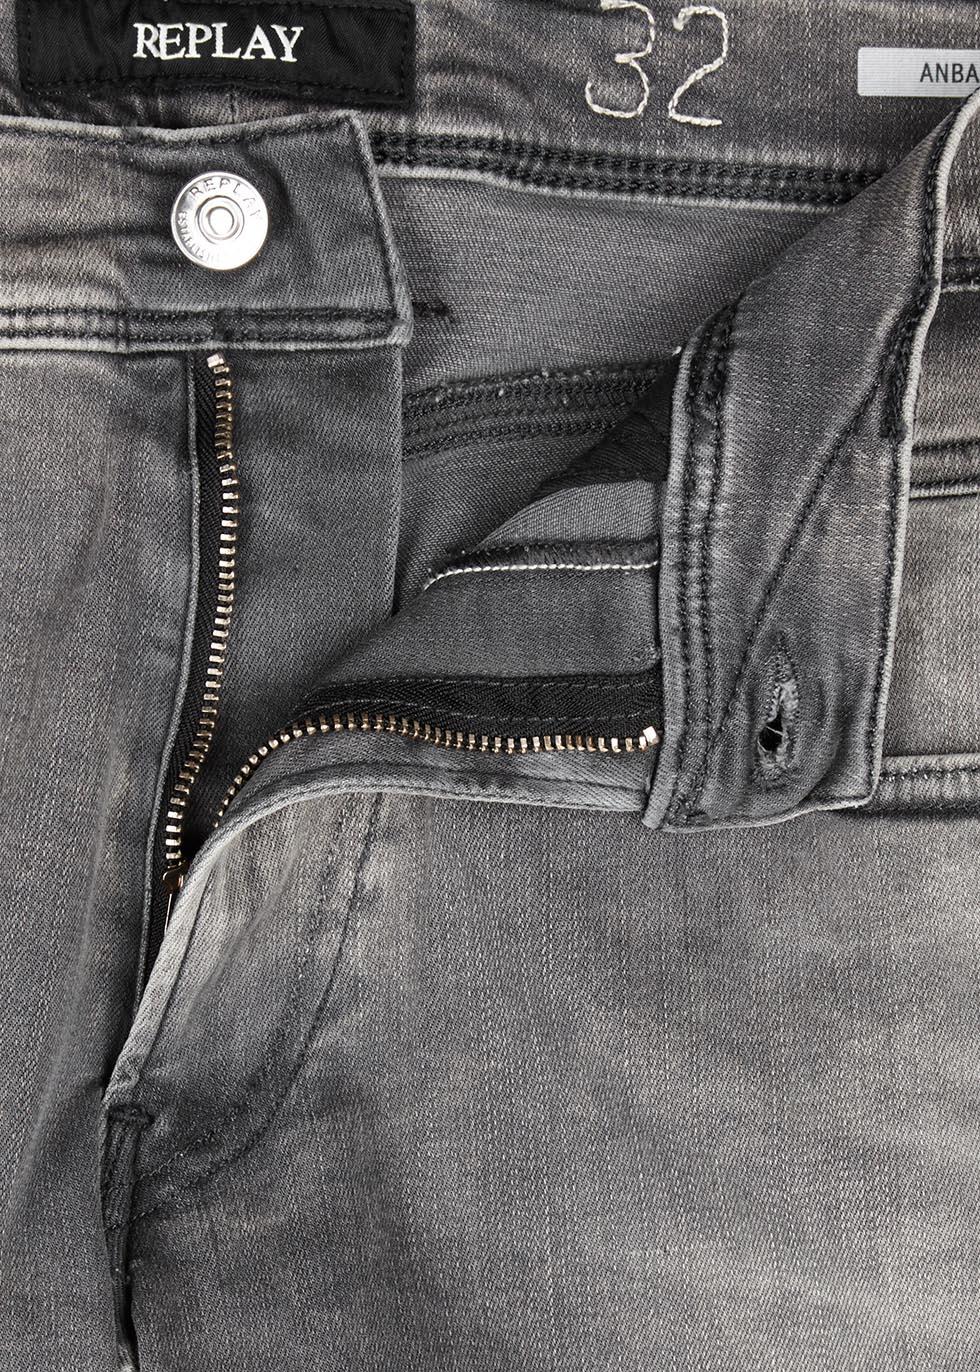 Anbass Hyperflex grey slim-leg jeans - Replay